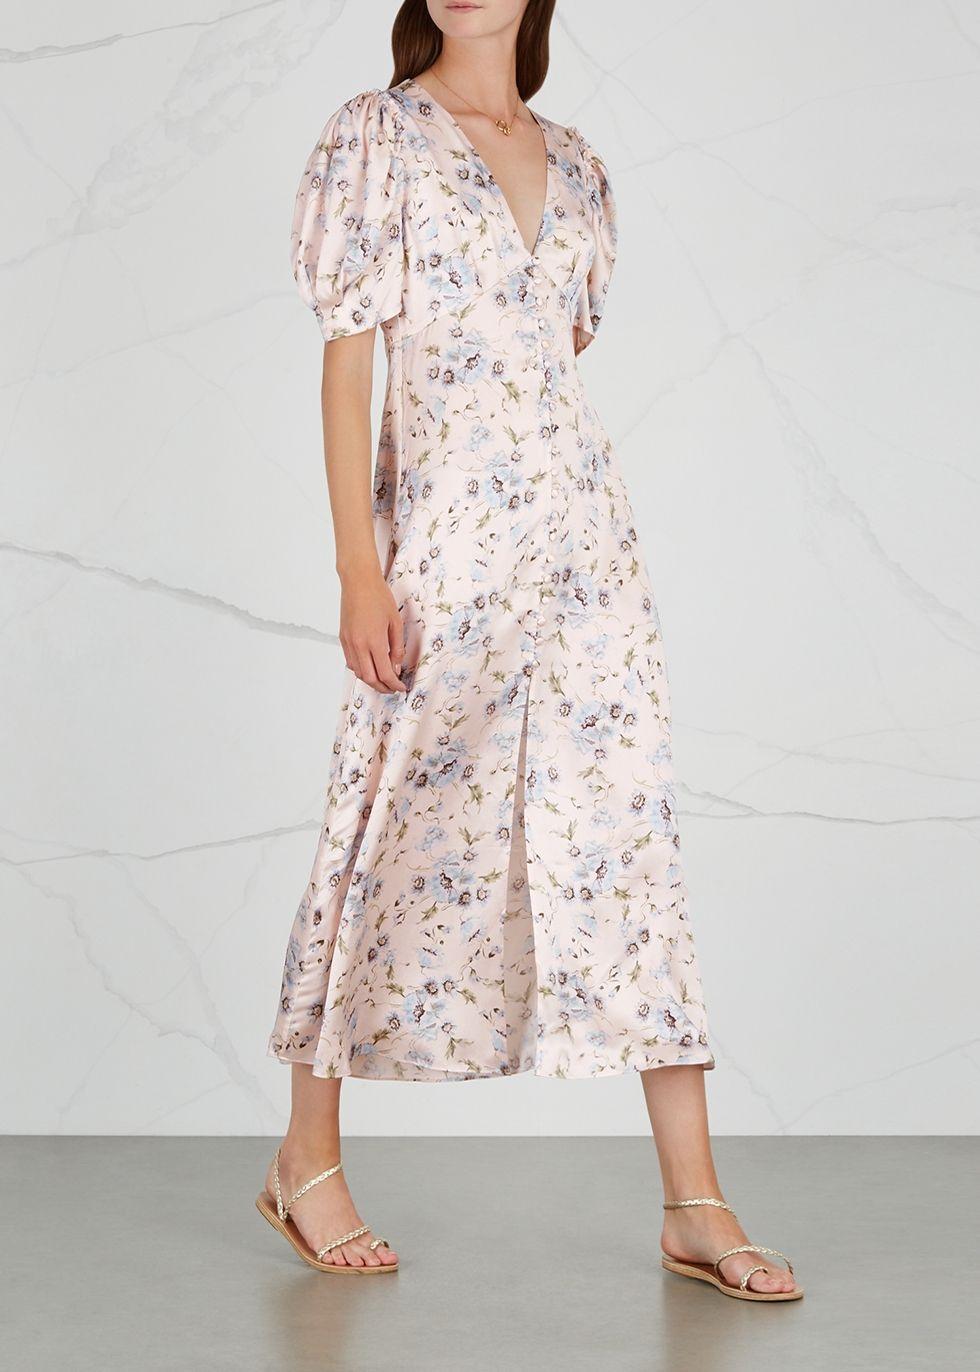 Loveshackfancy Delaney Printed Silk Midi Dress Harvey Nichols Dresses Silk Midi Dress Summer Dresses [ 1372 x 980 Pixel ]